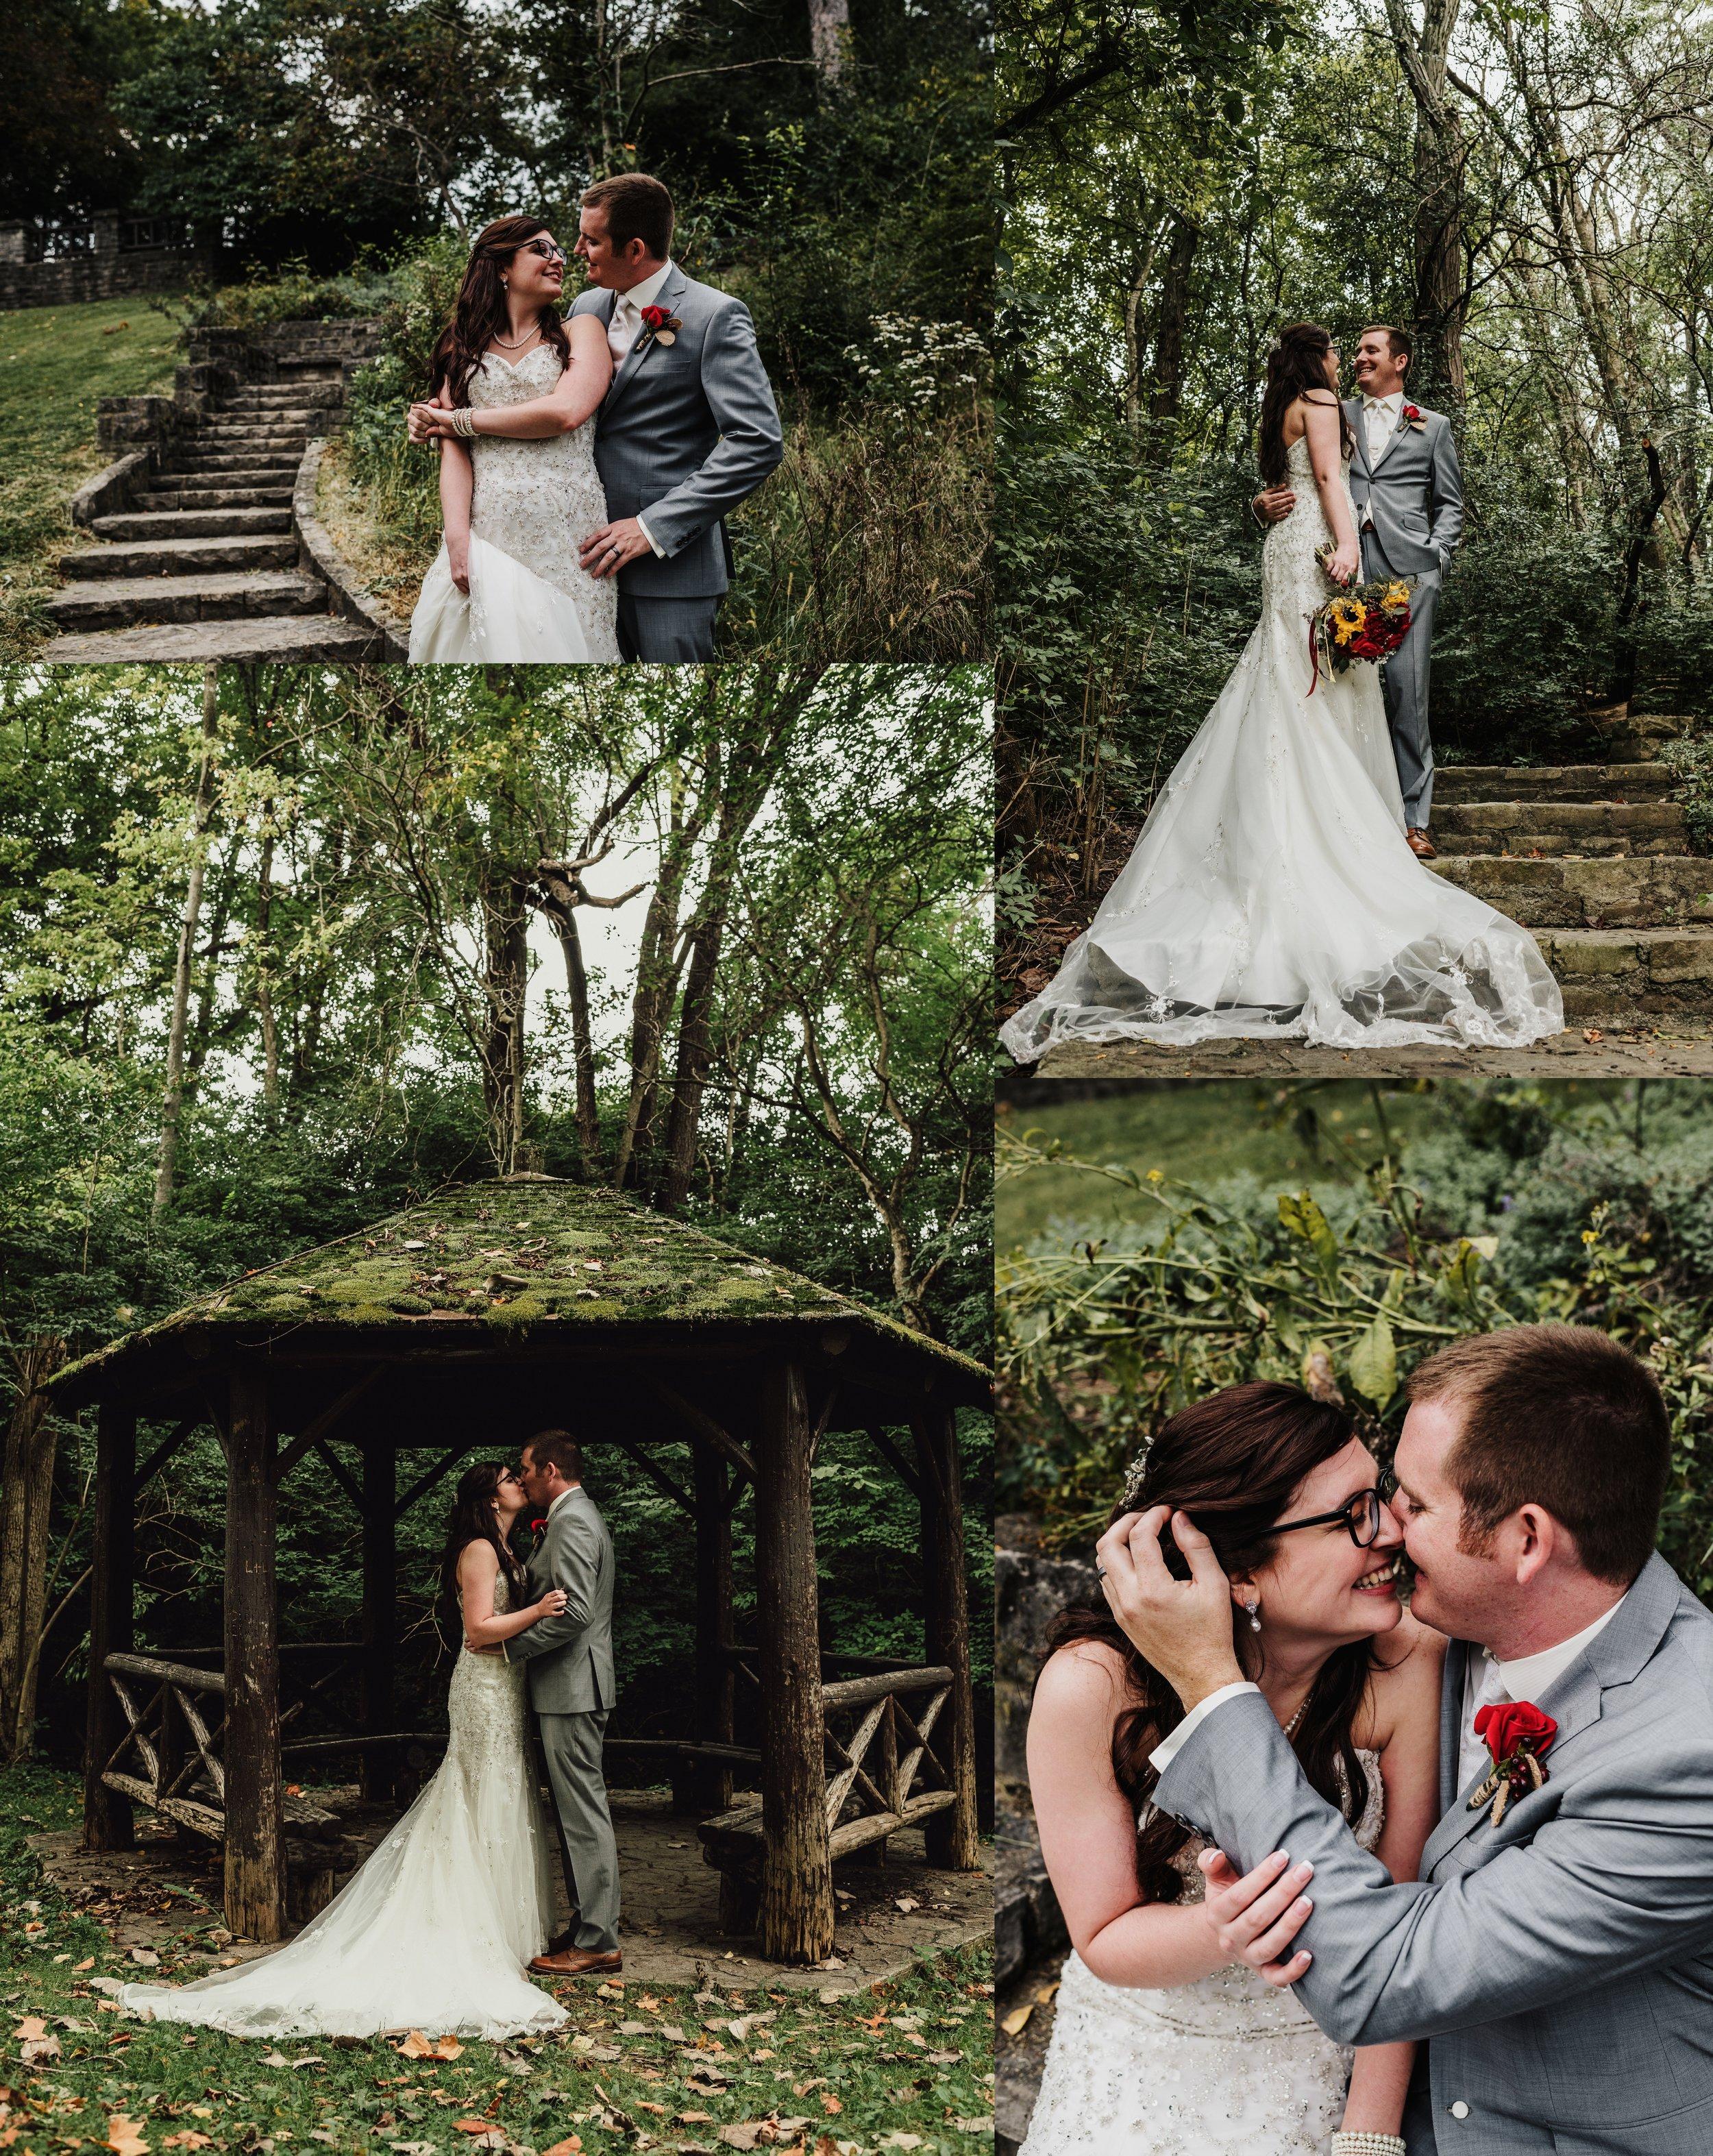 Vintage Wedding   Maumee, Ohio   Ohio Wedding Photography   Rustic Fall Wedding   Toledo, Ohio   Terry Farms Photography